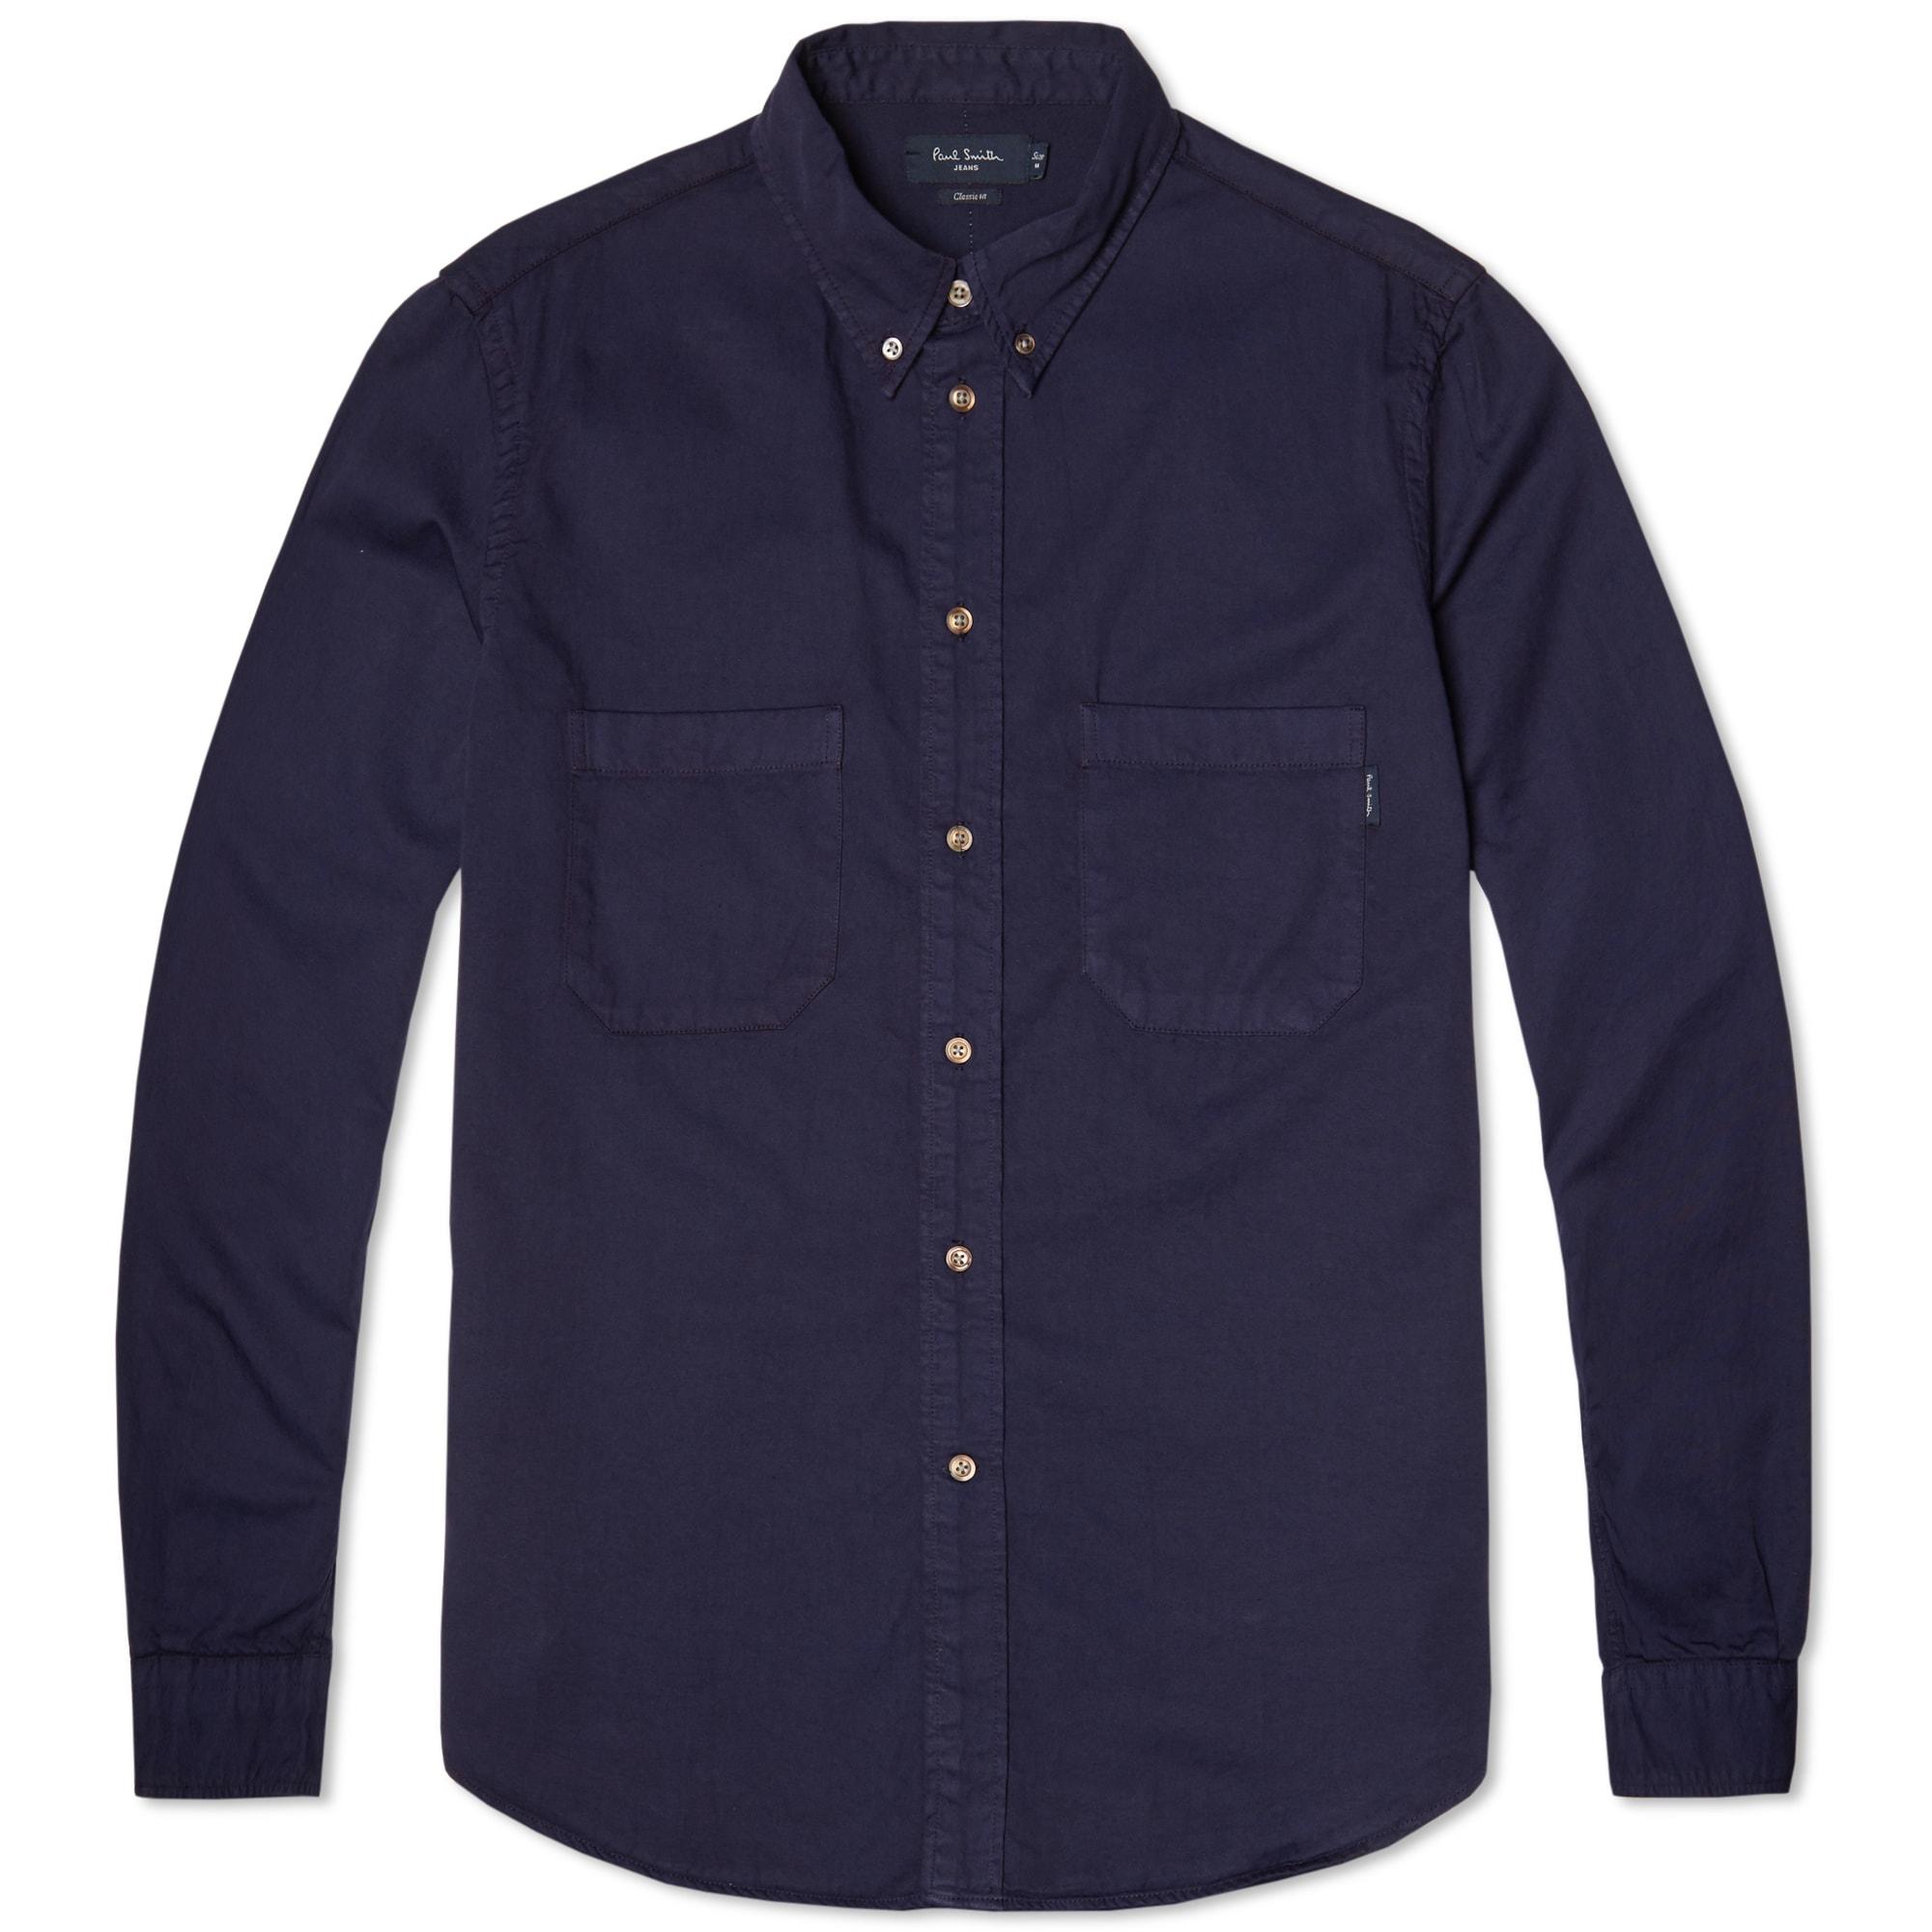 Paul smith button down garment dyed heavy twill shirt indigo for Heavy button down shirts